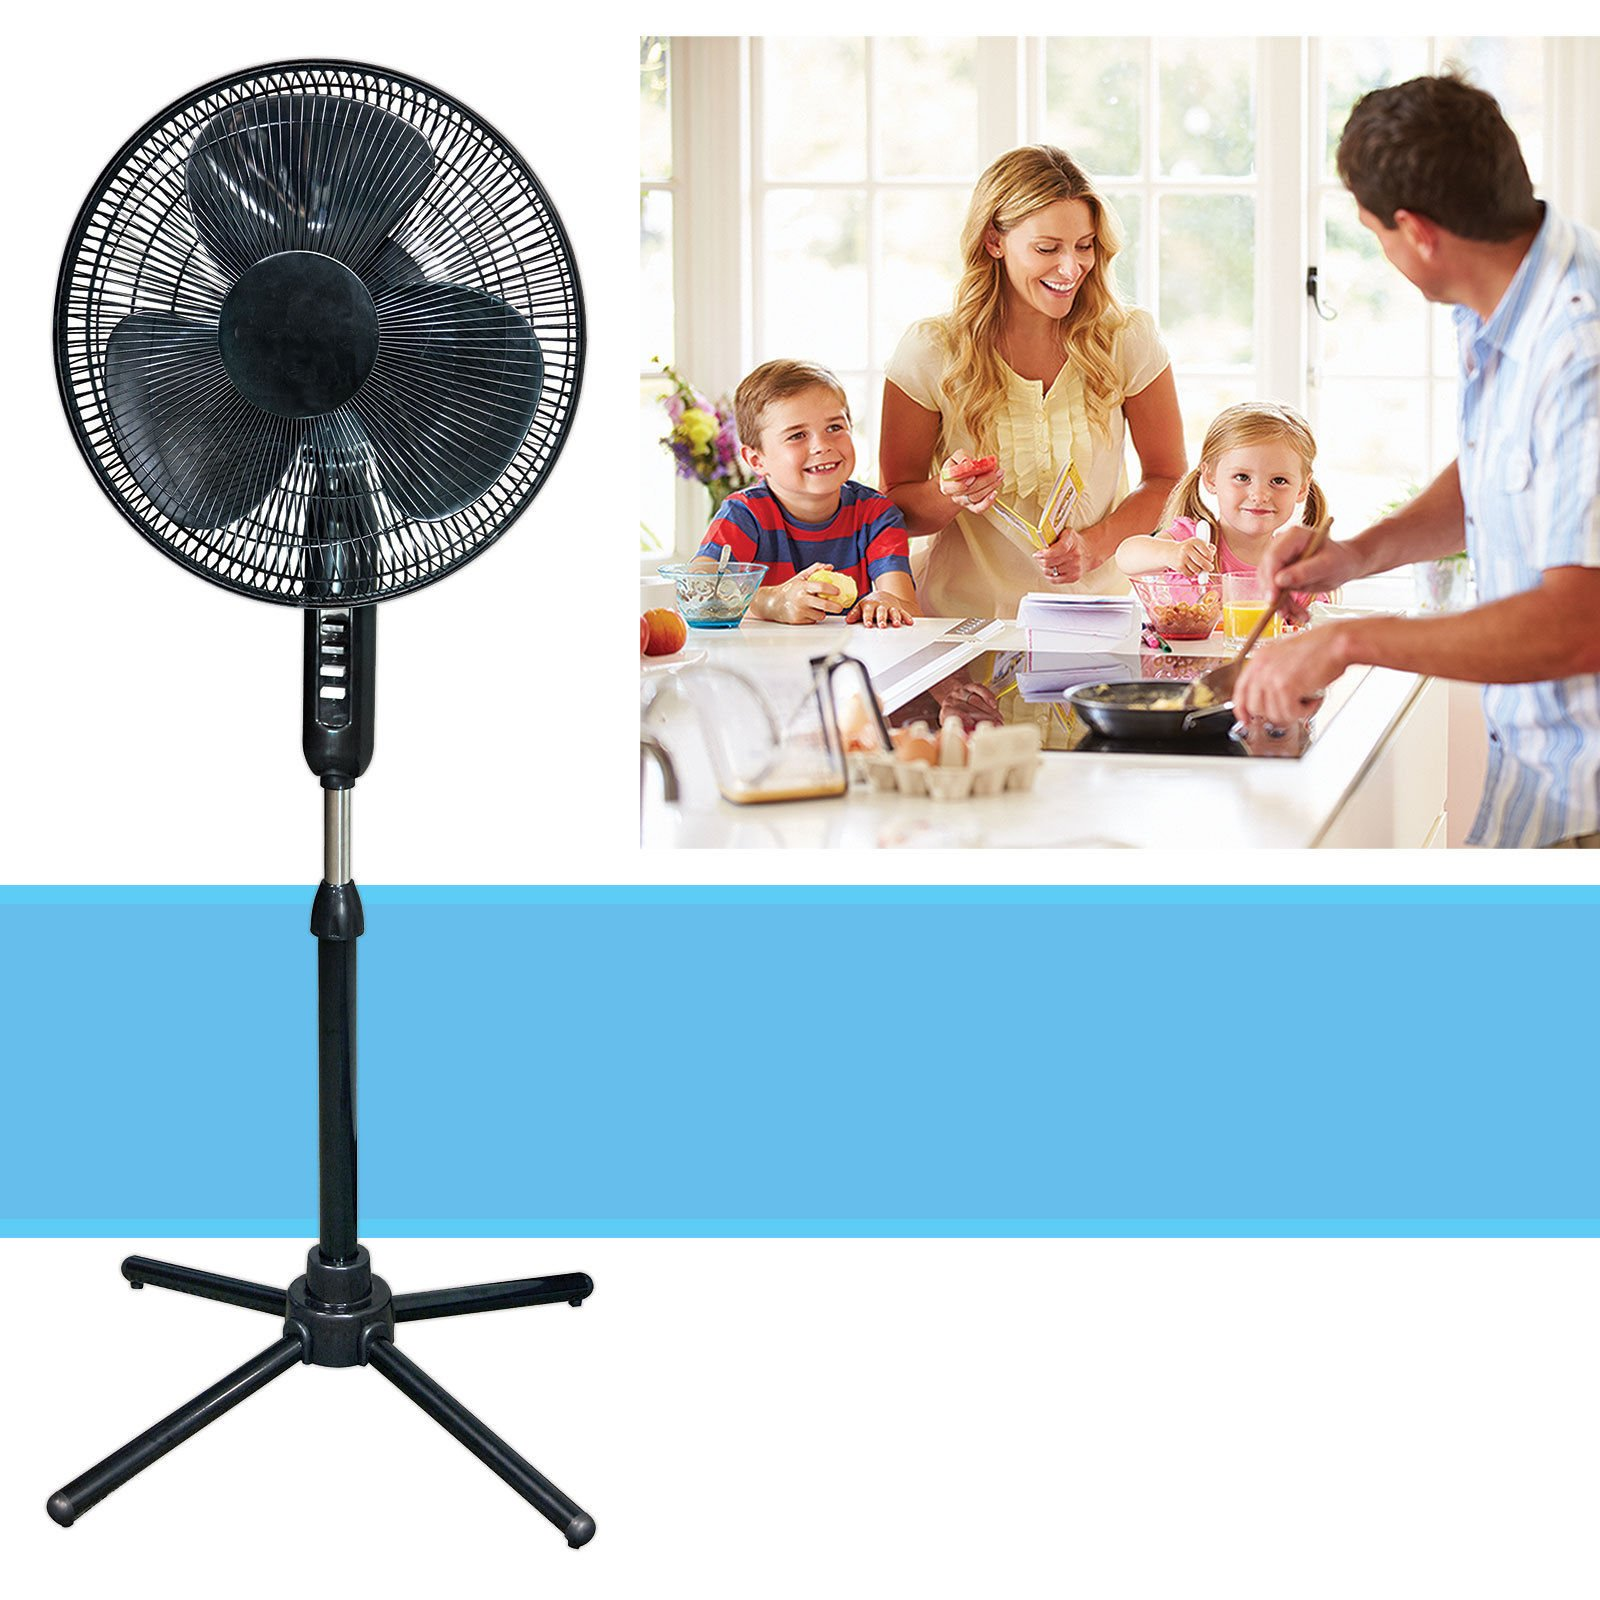 SD Oscillating Pedestal 16-Inch Stand Fan Quiet Adjustable 3 Speed, Black